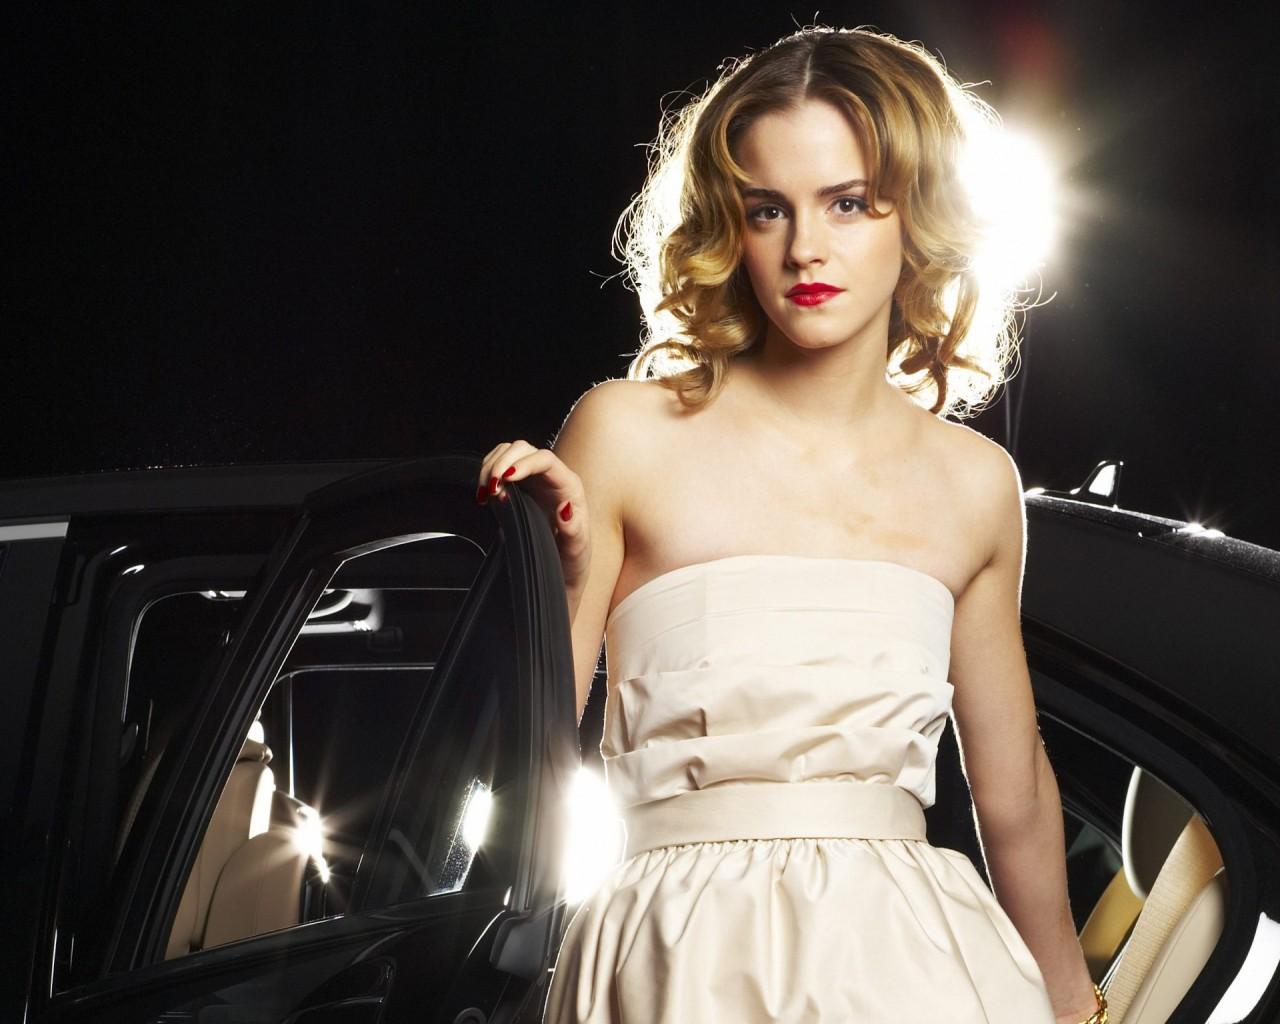 Makeup Iphone Wallpaper Emma Watson Best Wallpapers Hd Wallpapers Id 932